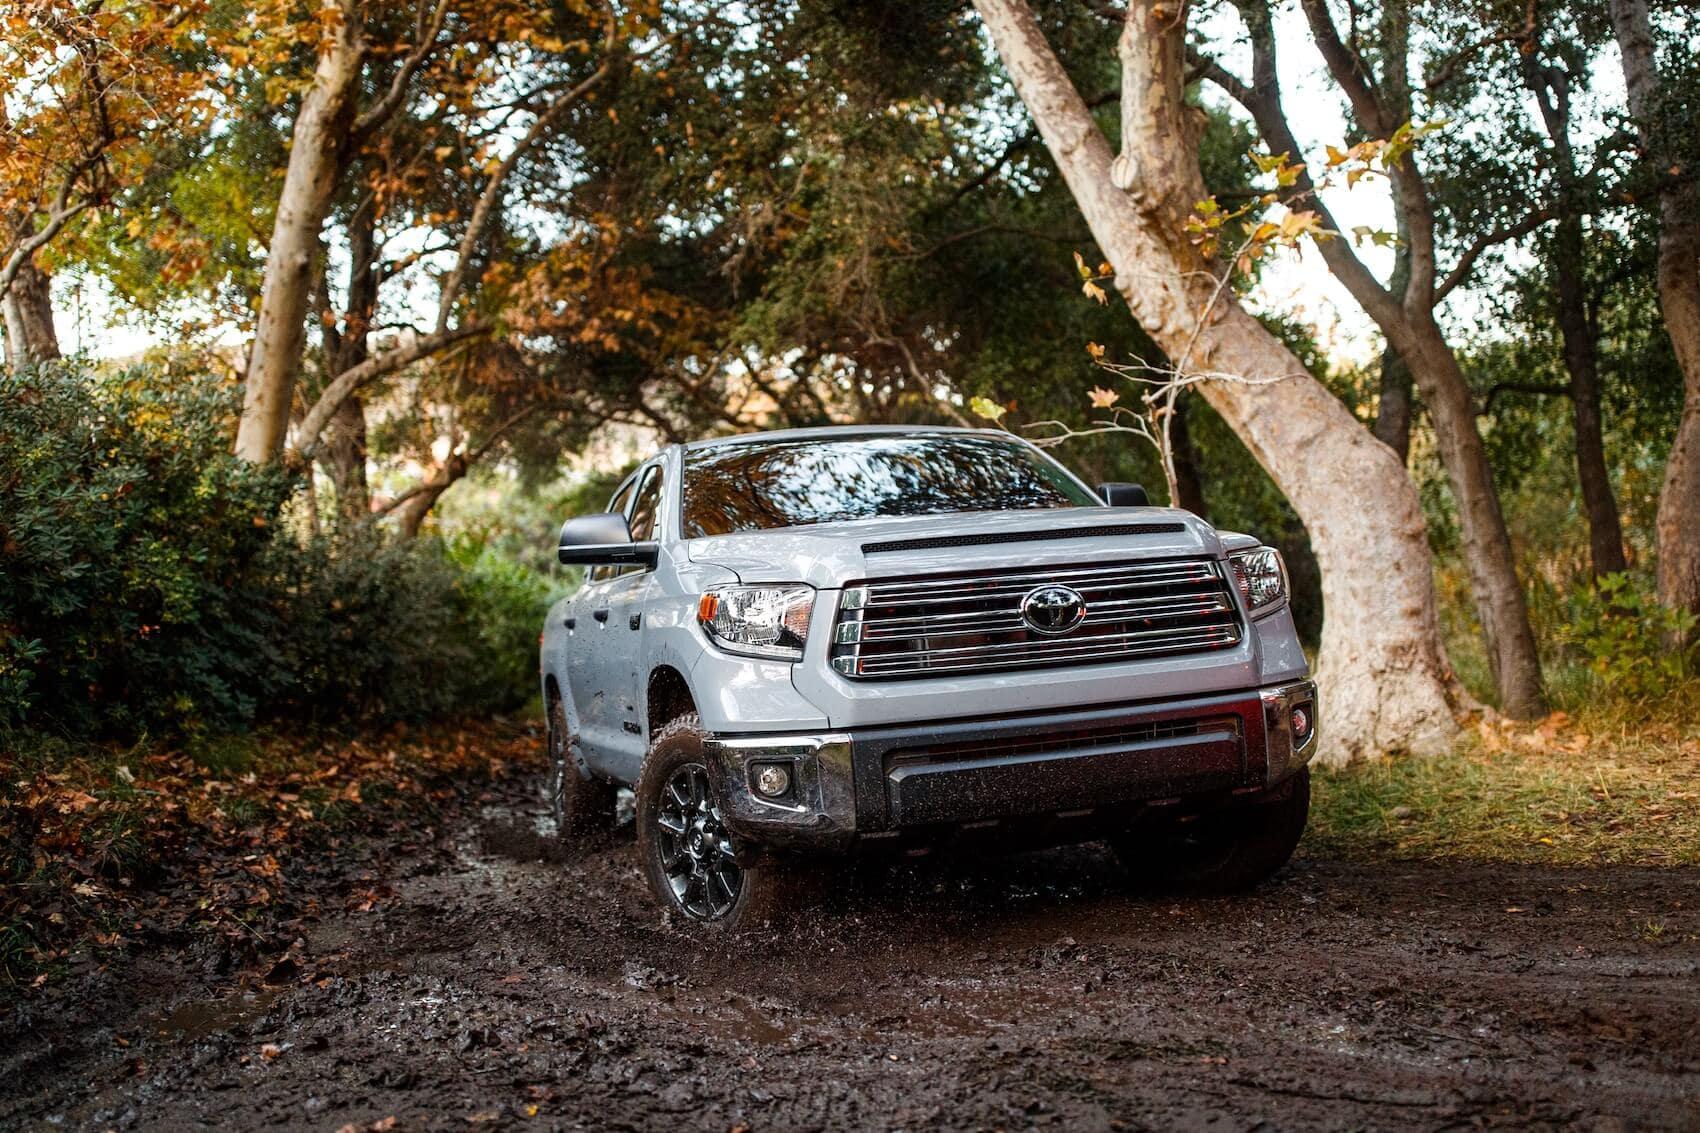 Toyota Tundra: The Big Boss Man